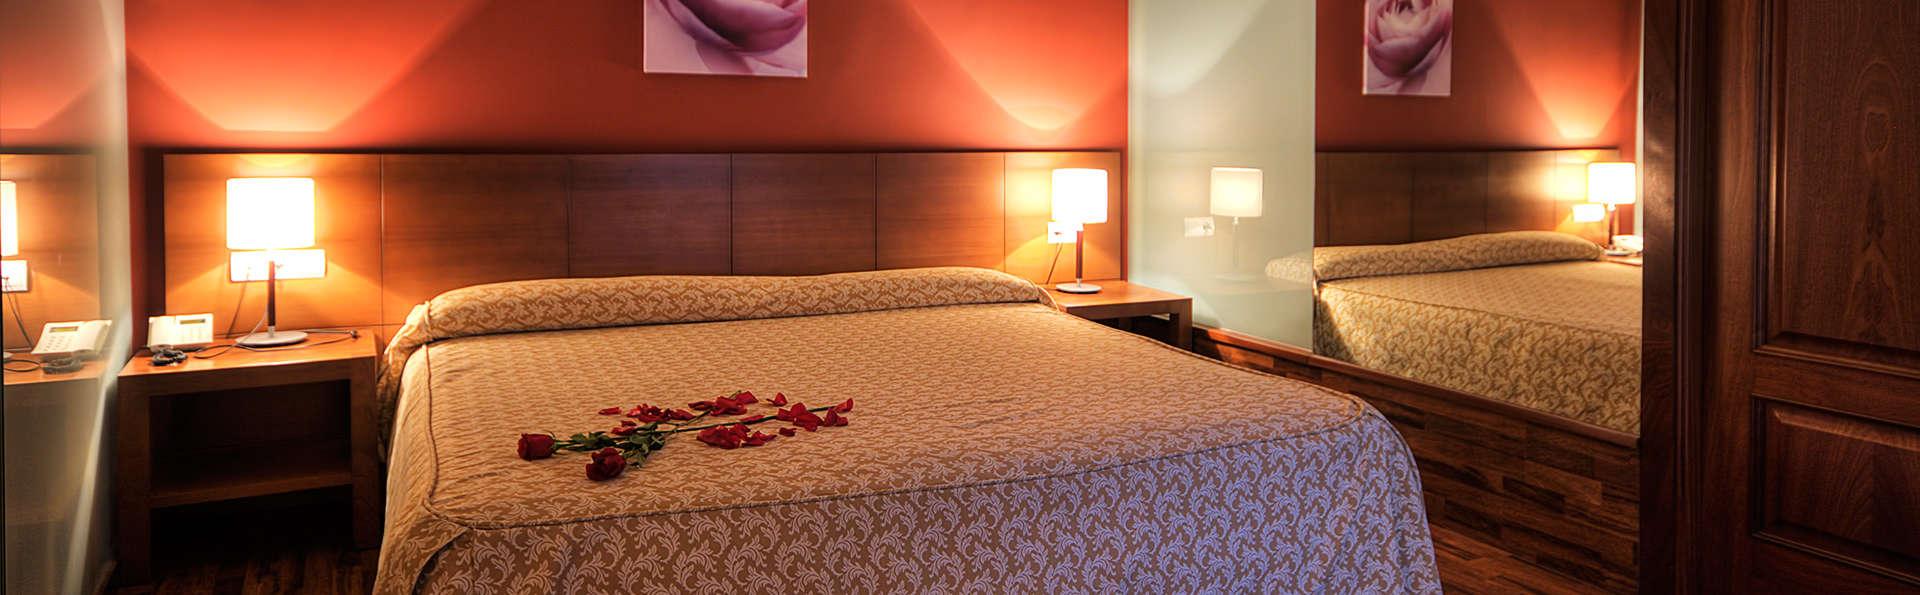 Hotel SPA Sinagoga - EDIT_room4.jpg